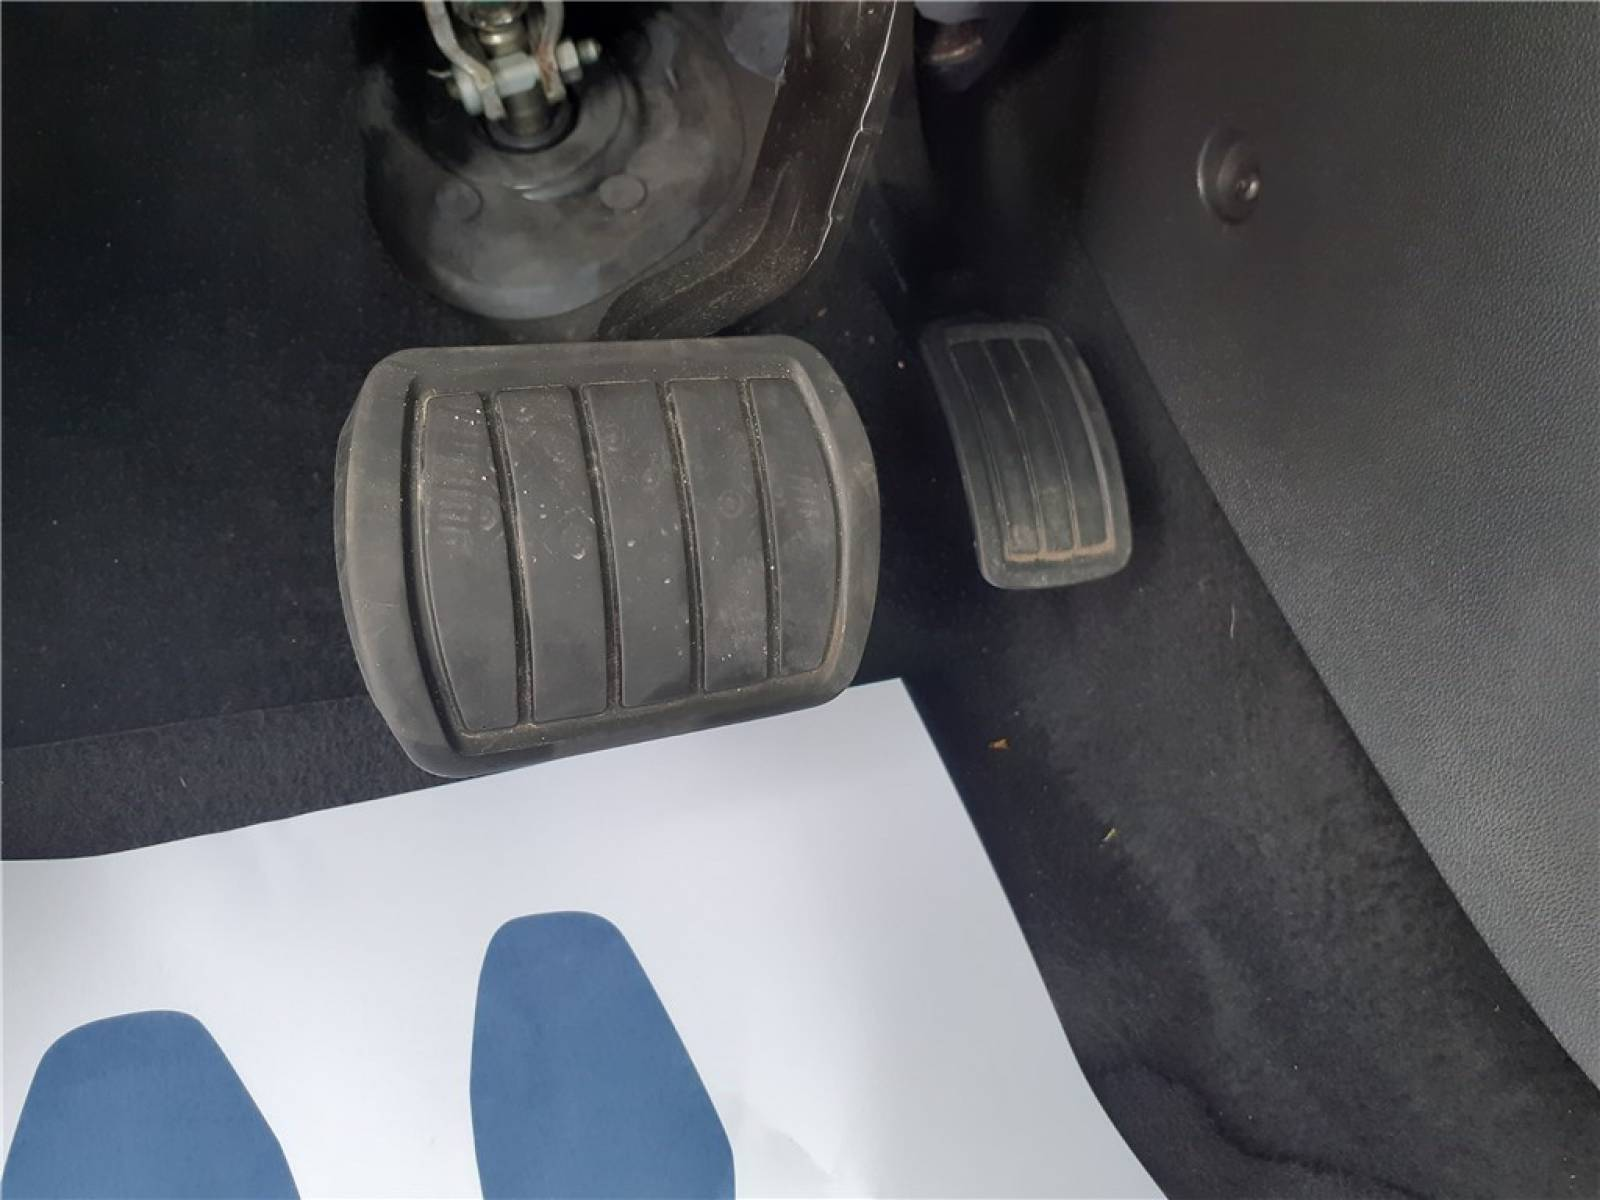 OPEL Grandland X 1.2 Turbo 130 ch BVA6 - véhicule d'occasion - Groupe Guillet - Opel Magicauto - Chalon-sur-Saône - 71380 - Saint-Marcel - 26